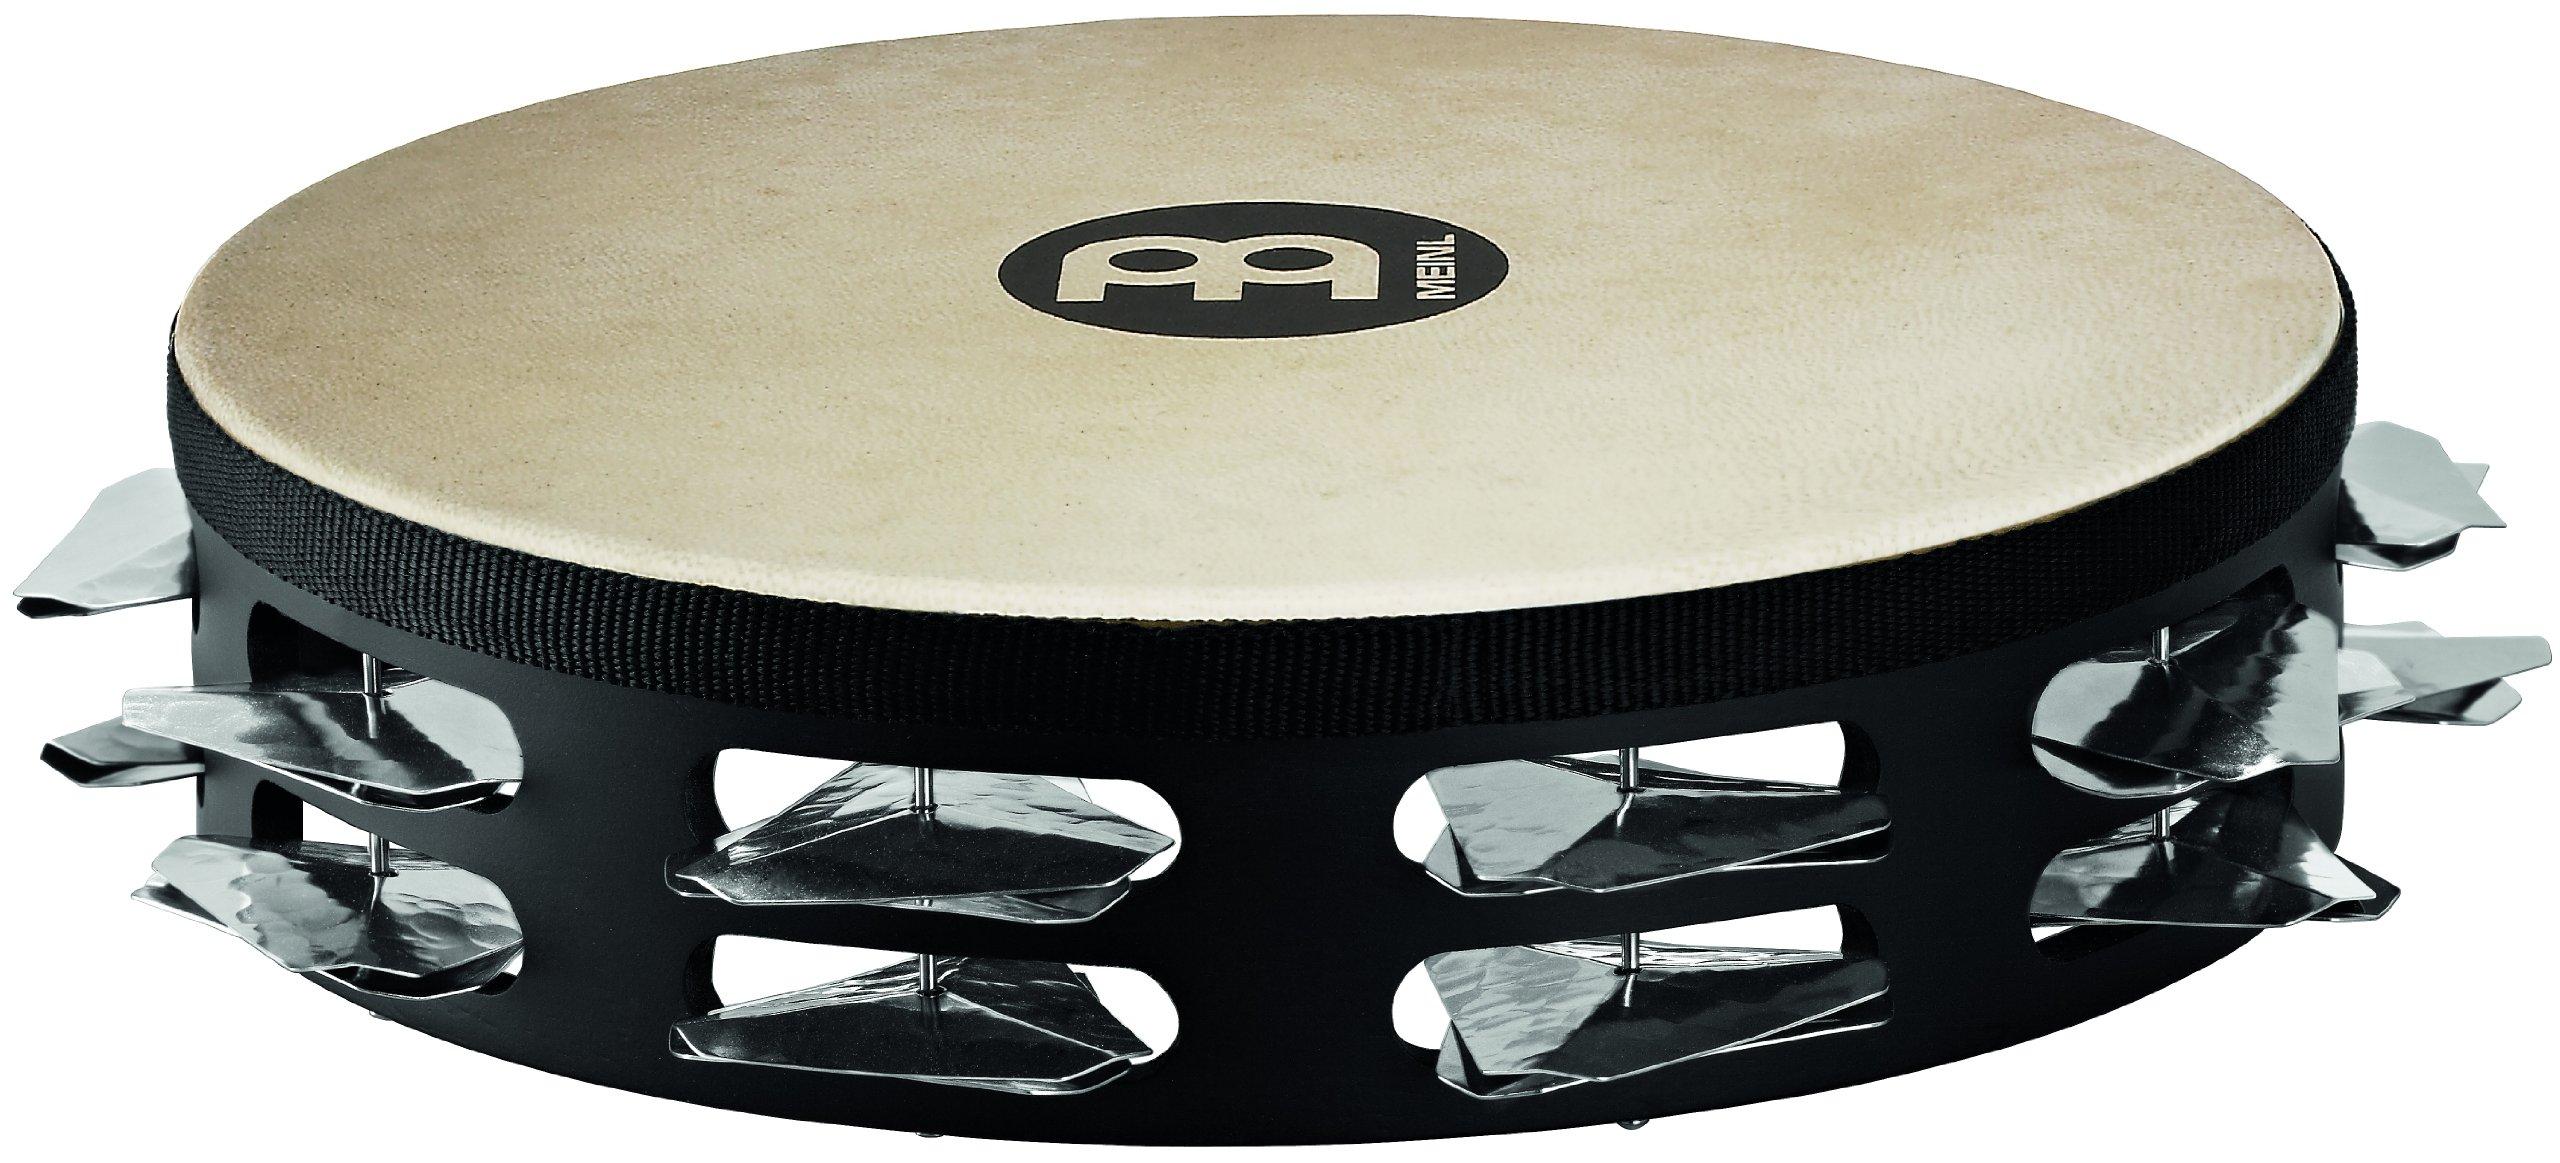 Meinl Percussion STAH2S-BK 10-Inch Headed Super Dry Studio Tambourine, 2 Rows Hammered Triangular Steel Jingles